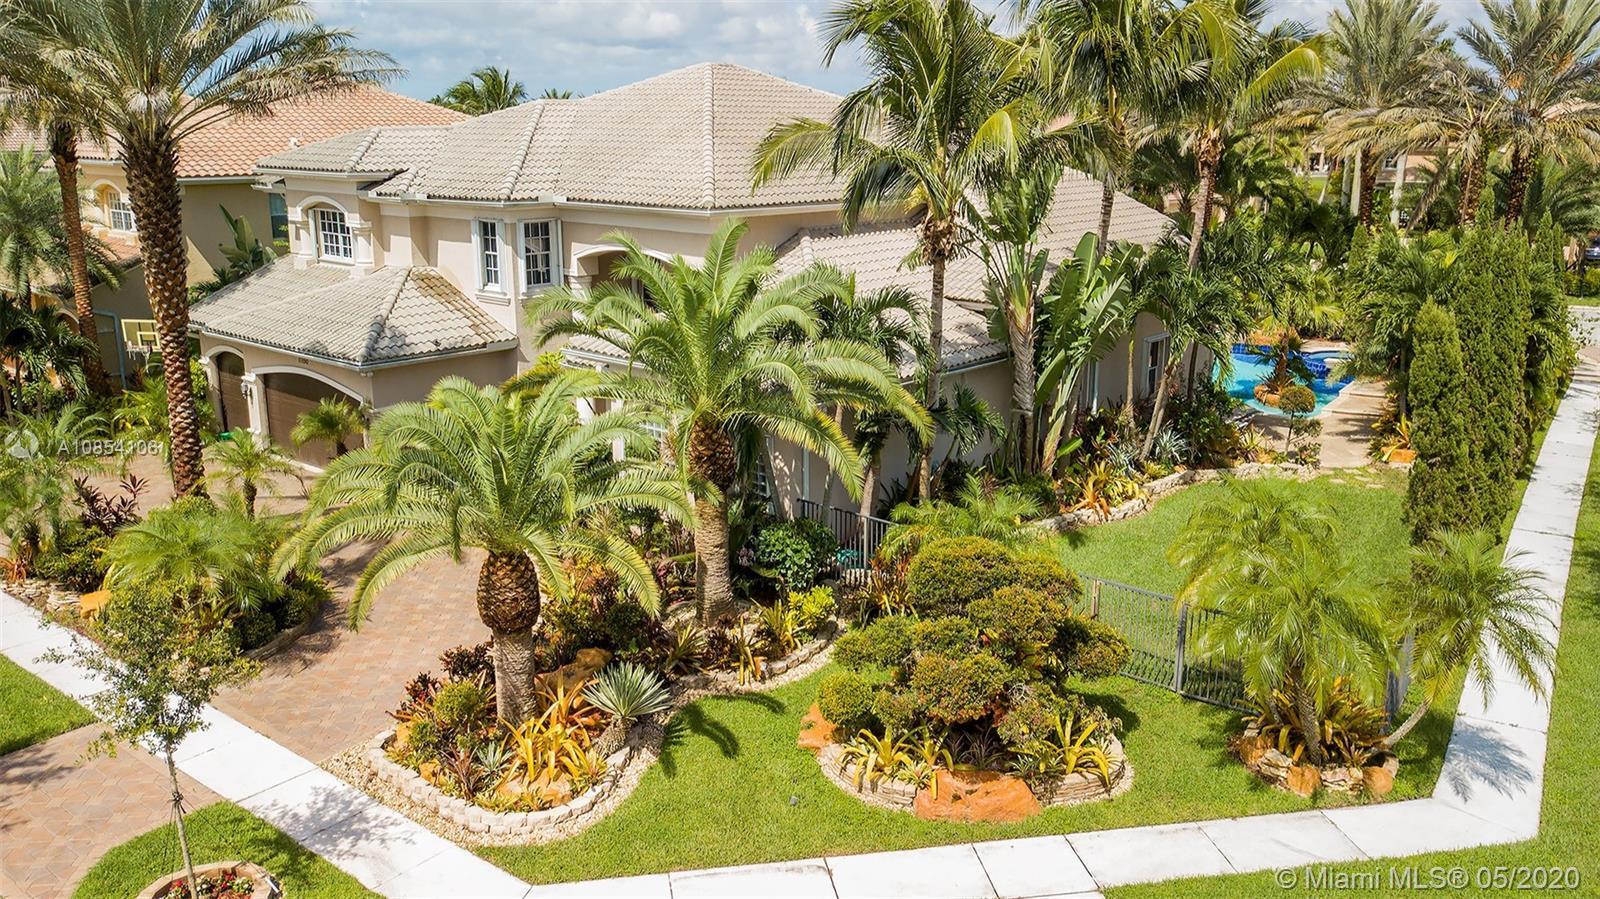 11150 Stonewood Forest Trail Property Photo - Boynton Beach, FL real estate listing